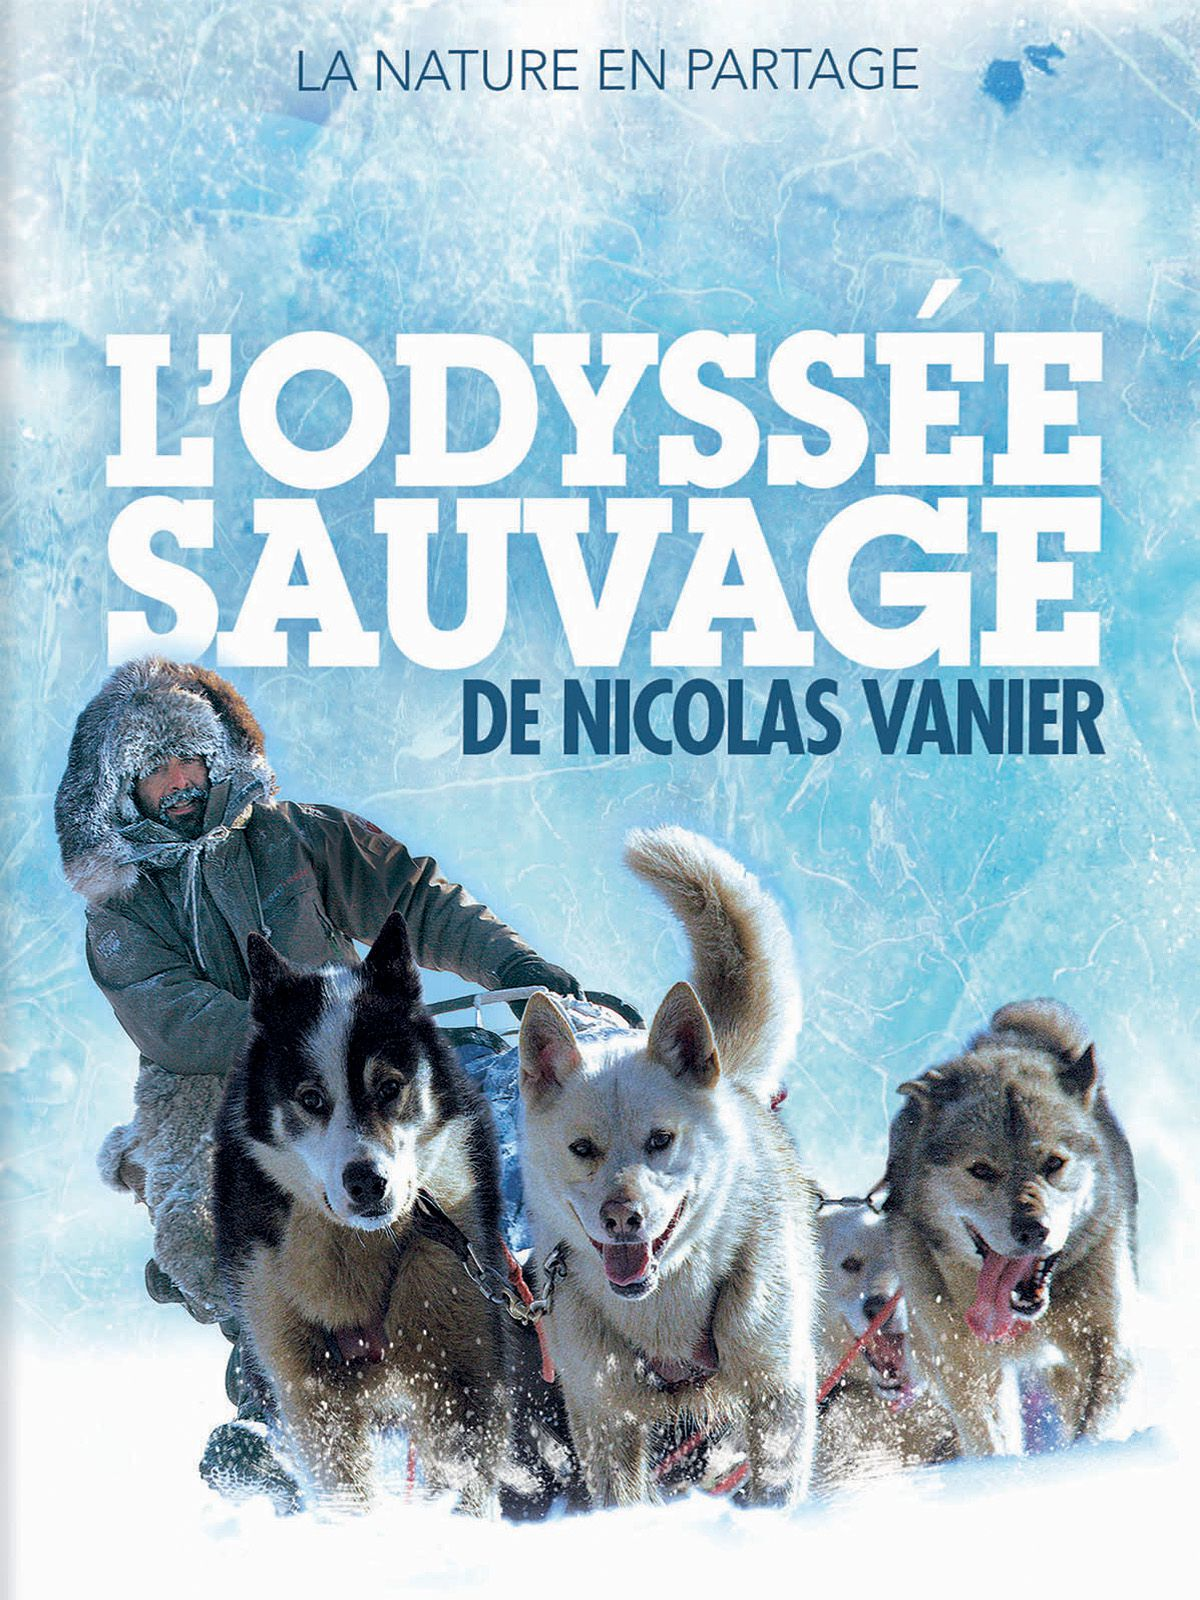 L'Odyssée sauvage - Documentaire (2006)